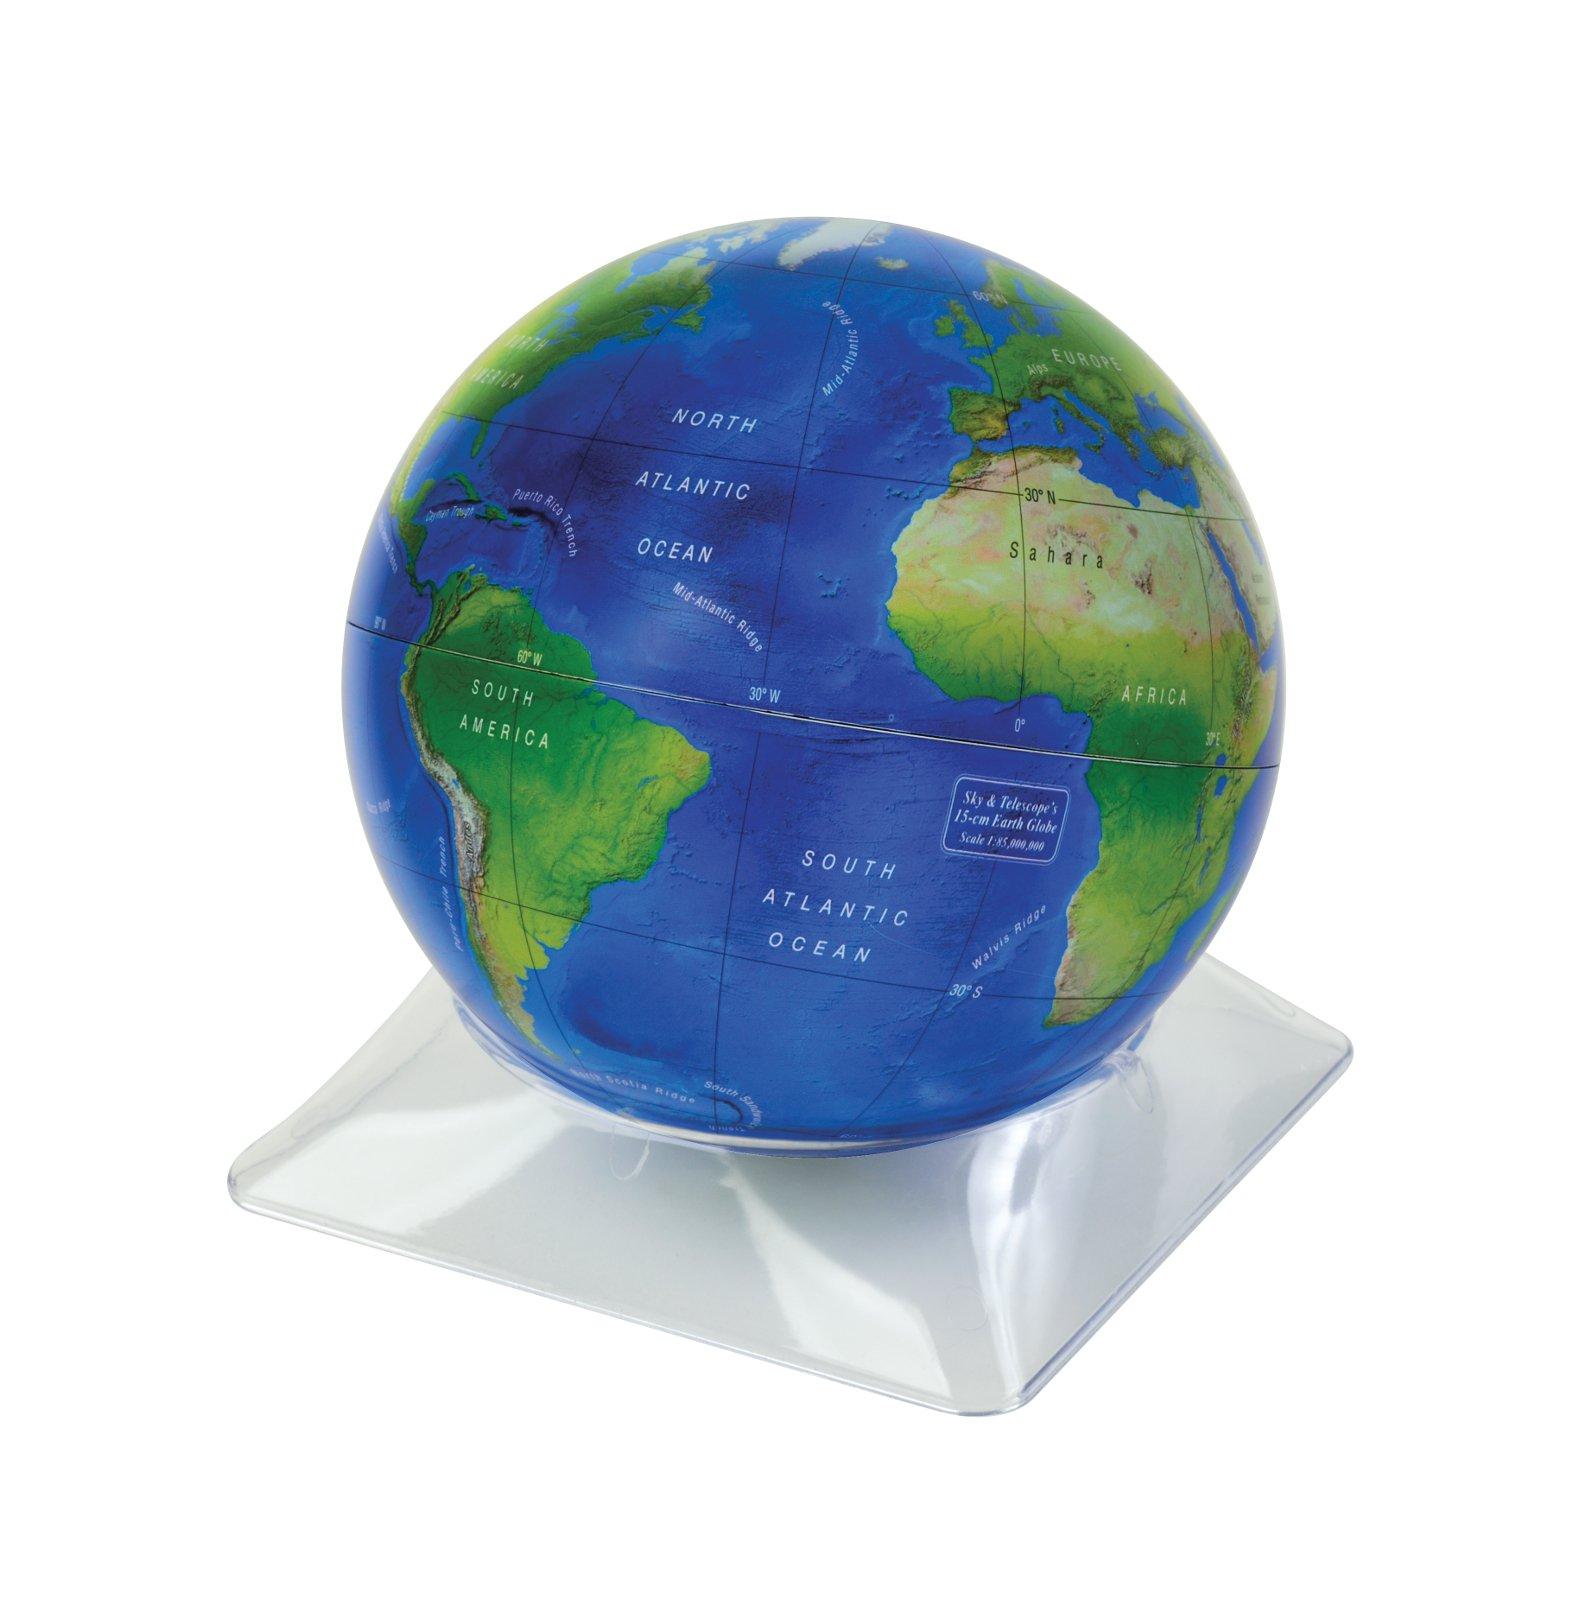 Download Sky & Telescope's 15-cm Earth Globe PDF